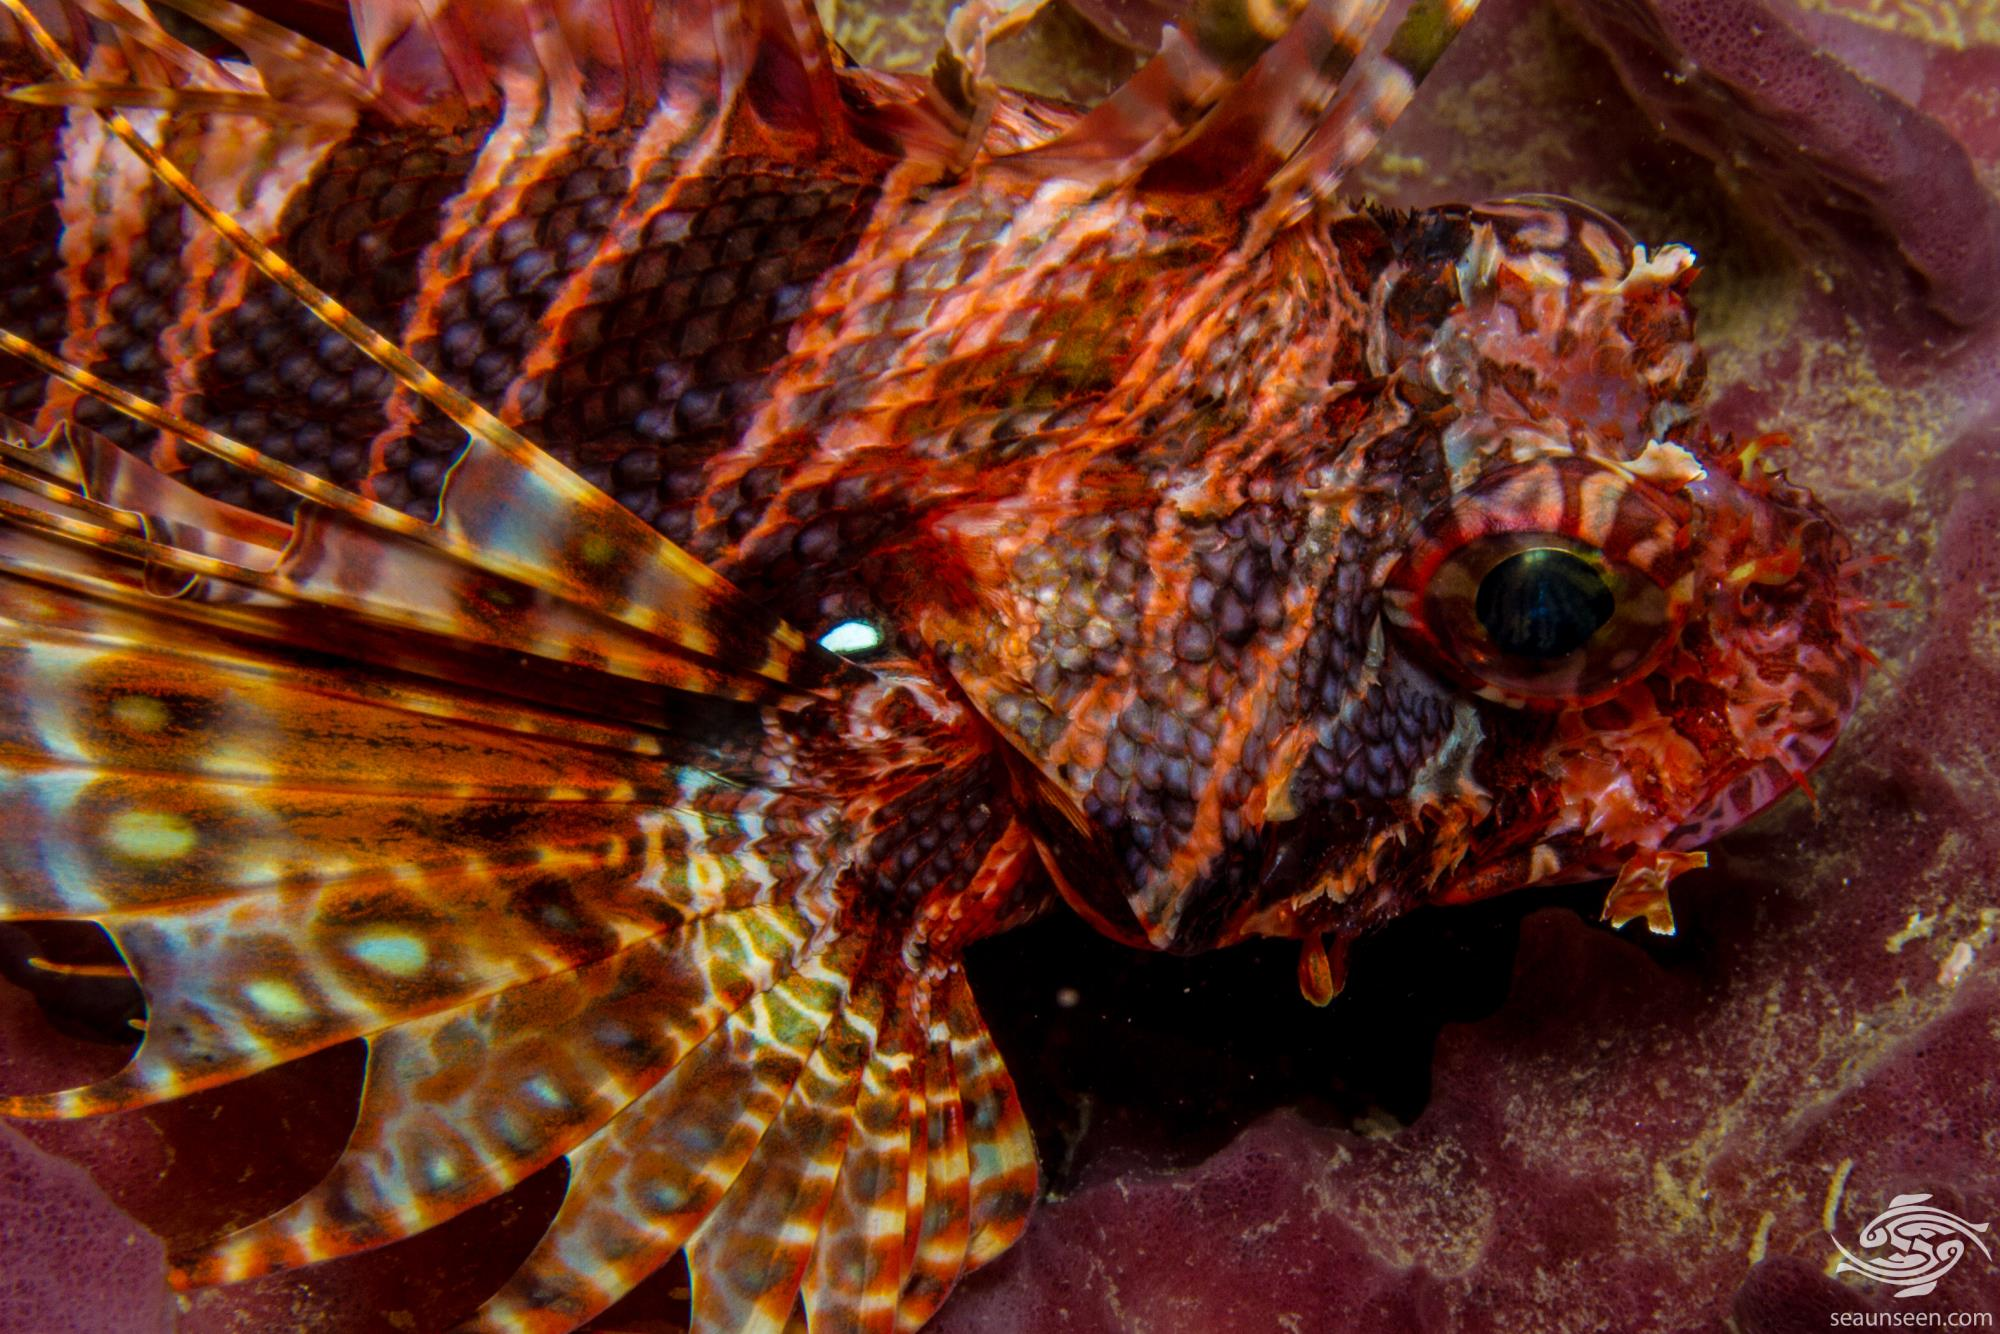 Mombasa Lionfish (Pterois mombasae)